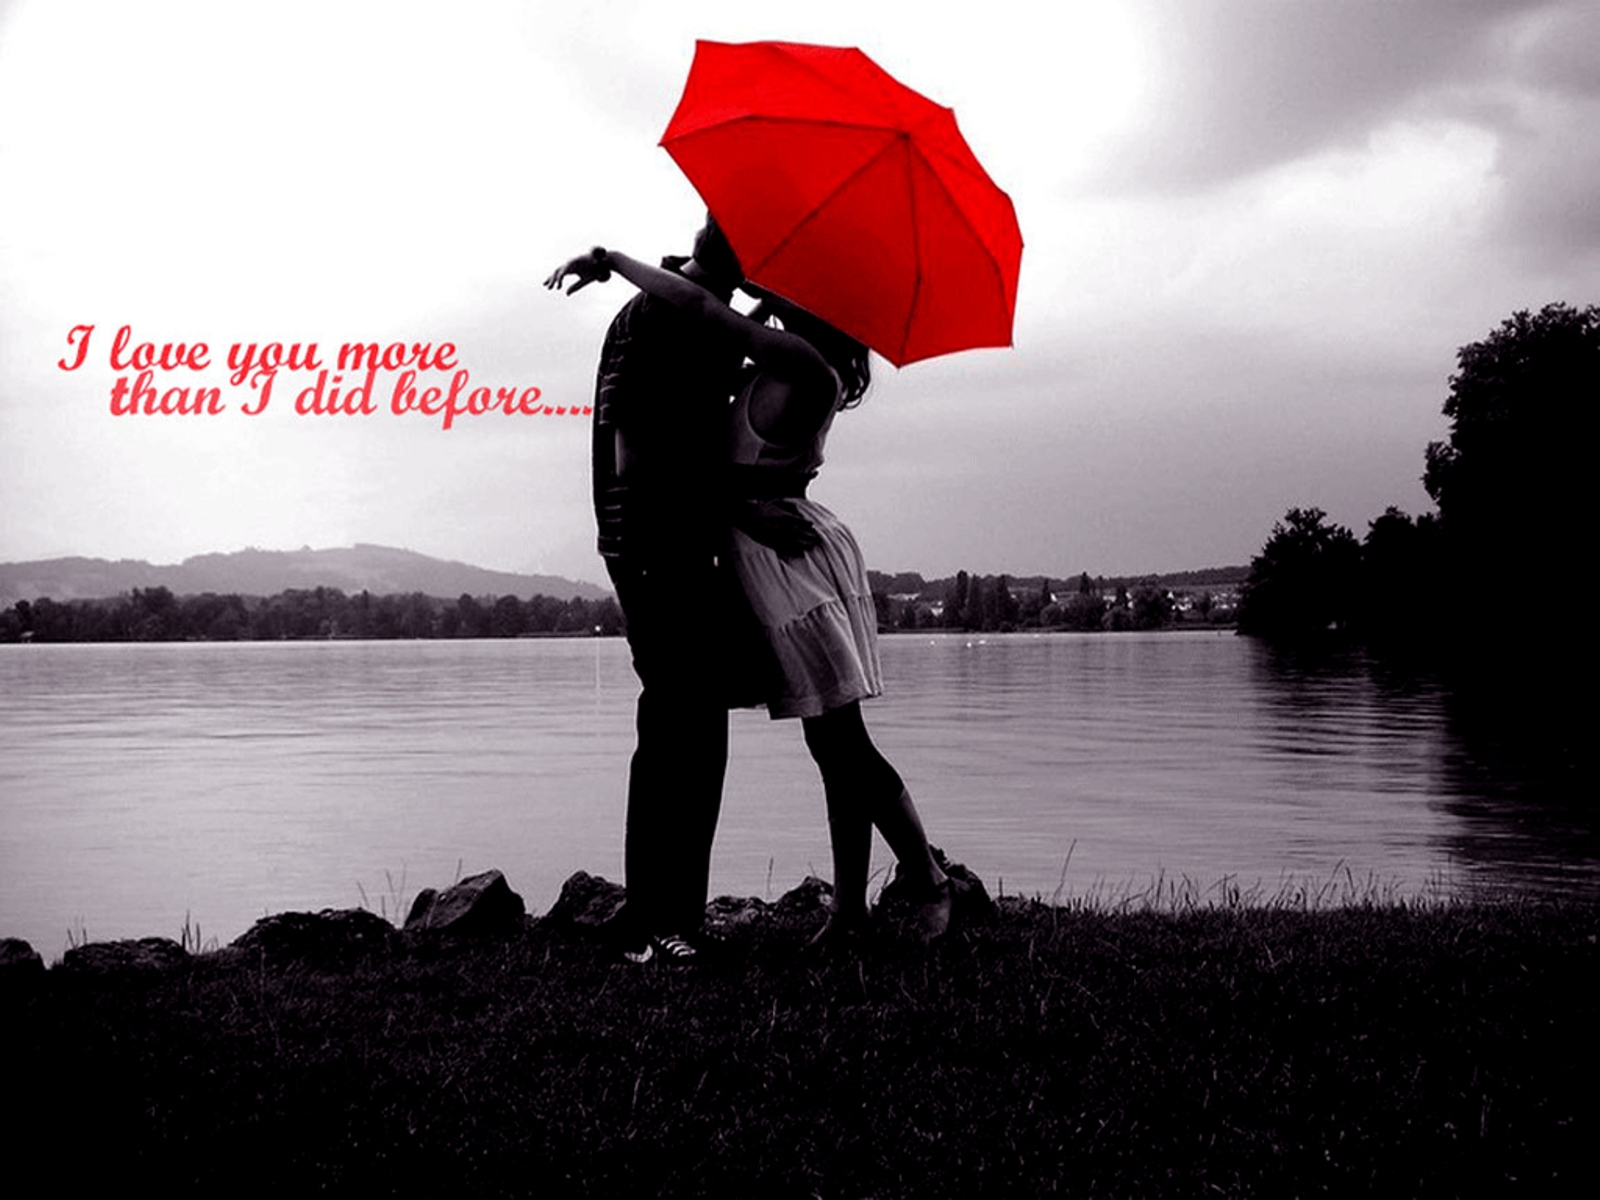 Amazing Wallpaper Mobile Kiss - jWgAa0  Trends_43999.jpg